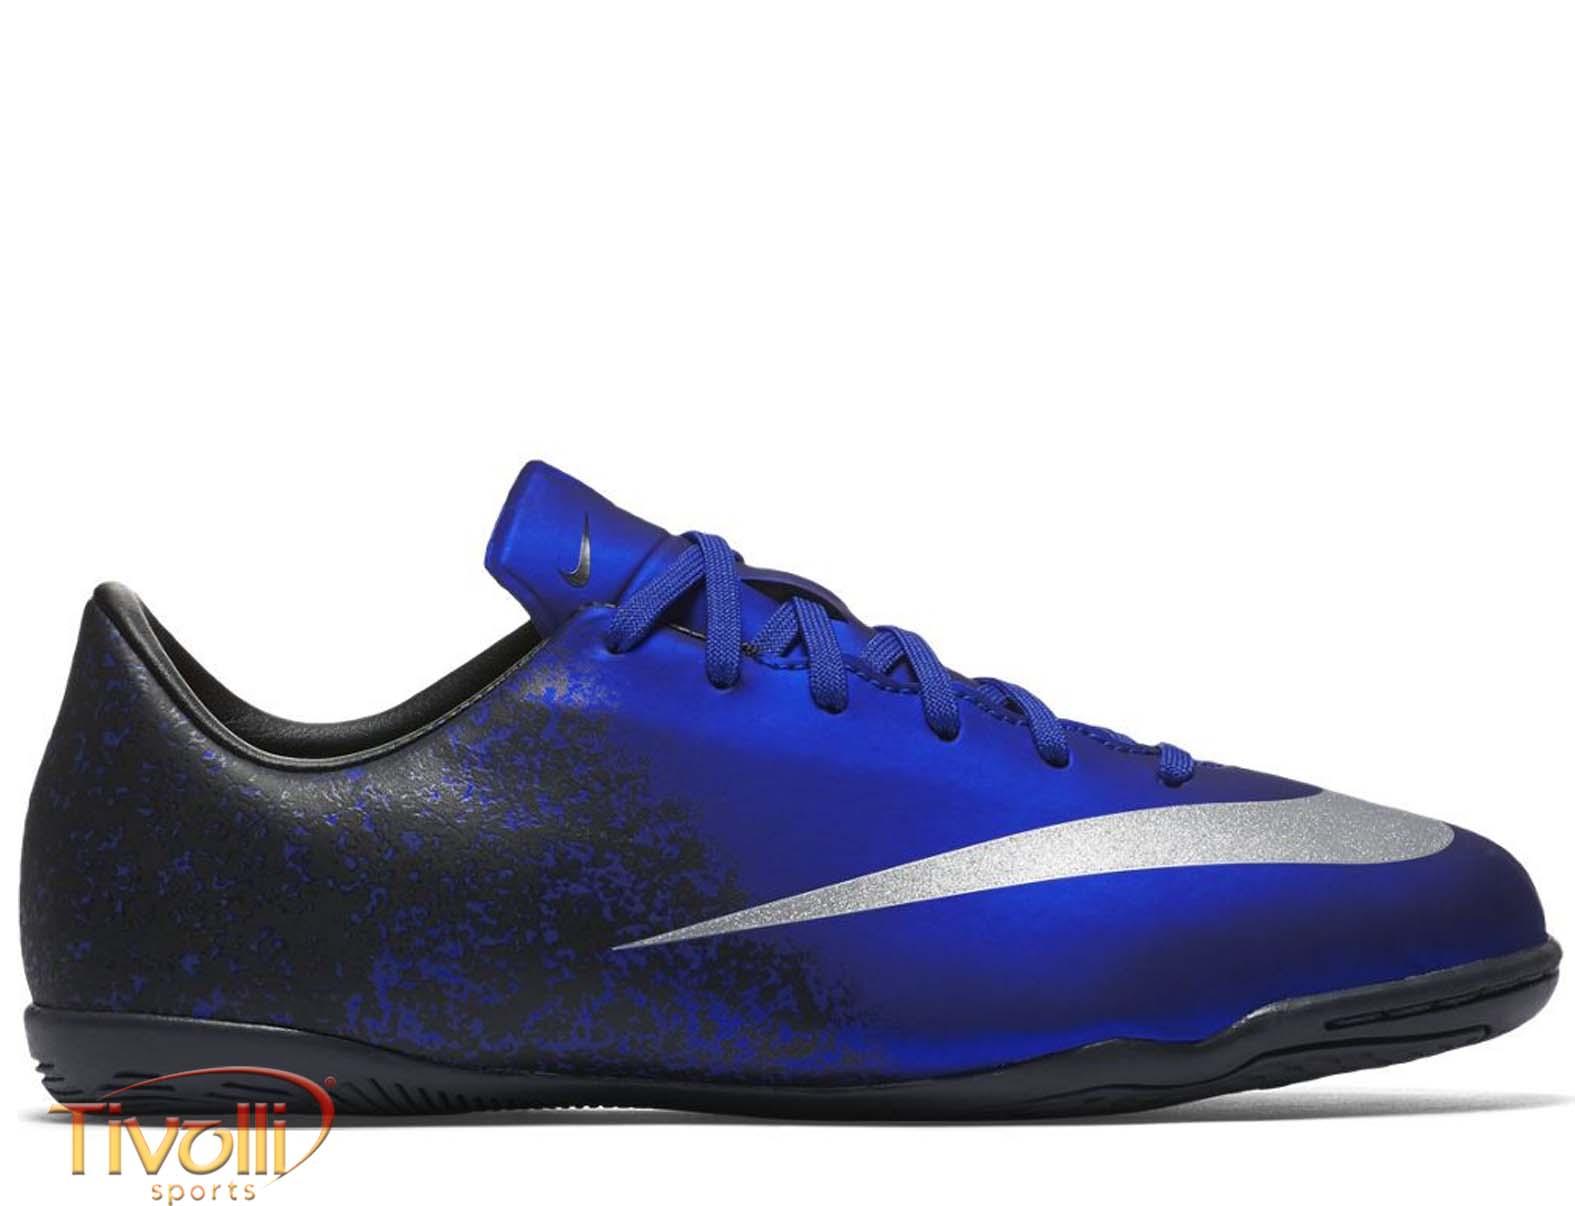 7b7ac1f4dcd0a Black Friday - Chuteira Nike Mercurial Victory V IC CR7 Futsal Azul